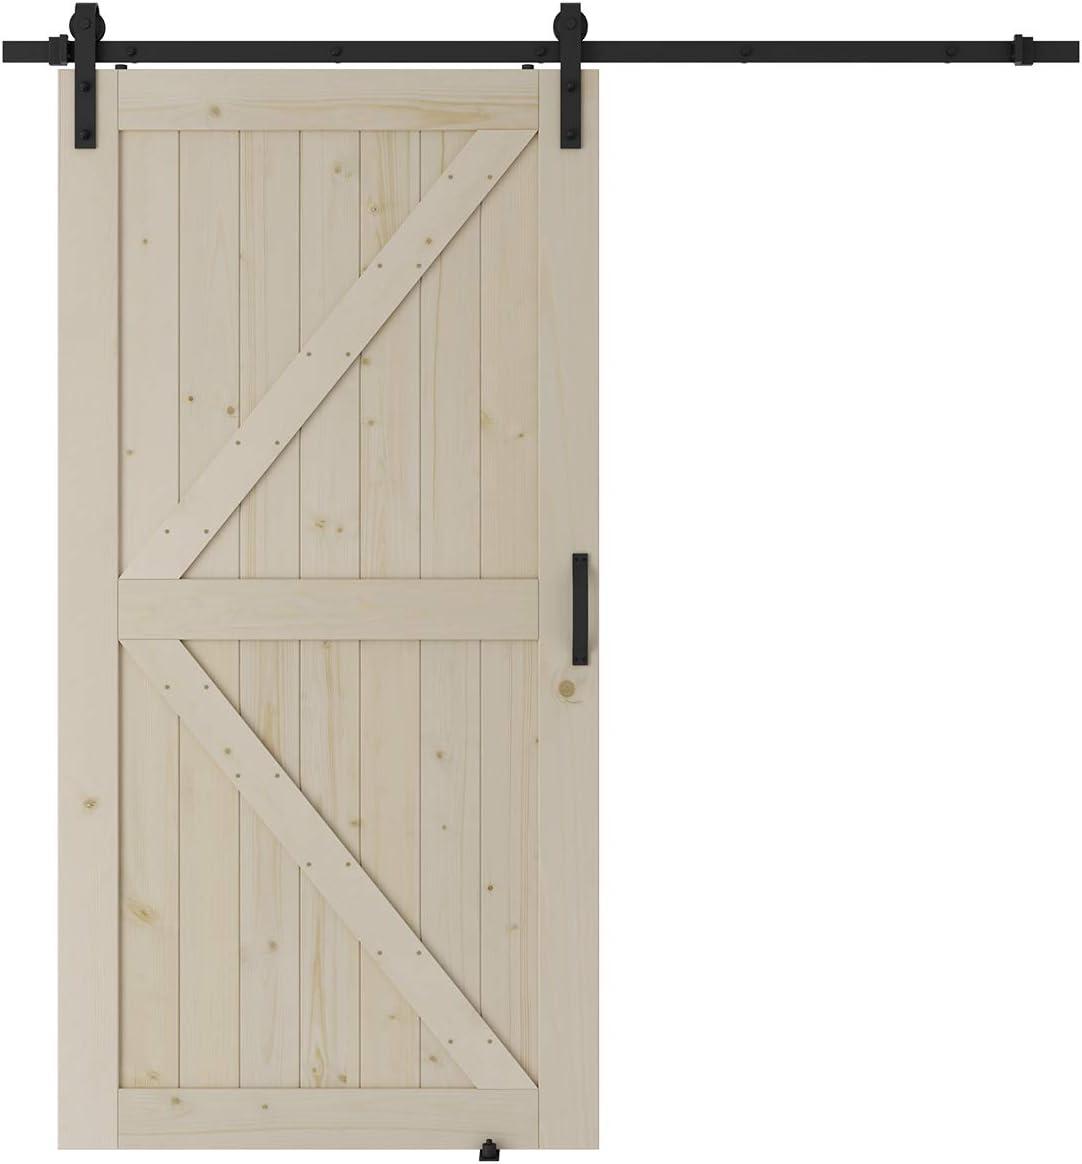 SMARTSTANDARD 42in x 84in Sliding Barn Door with 7ft Barn Door Hardware Kit /& Handle K-Frame Natural DIY Unfinished Solid Spruce Wood Panelled Slab Pre-Drilled Ready to Assemble